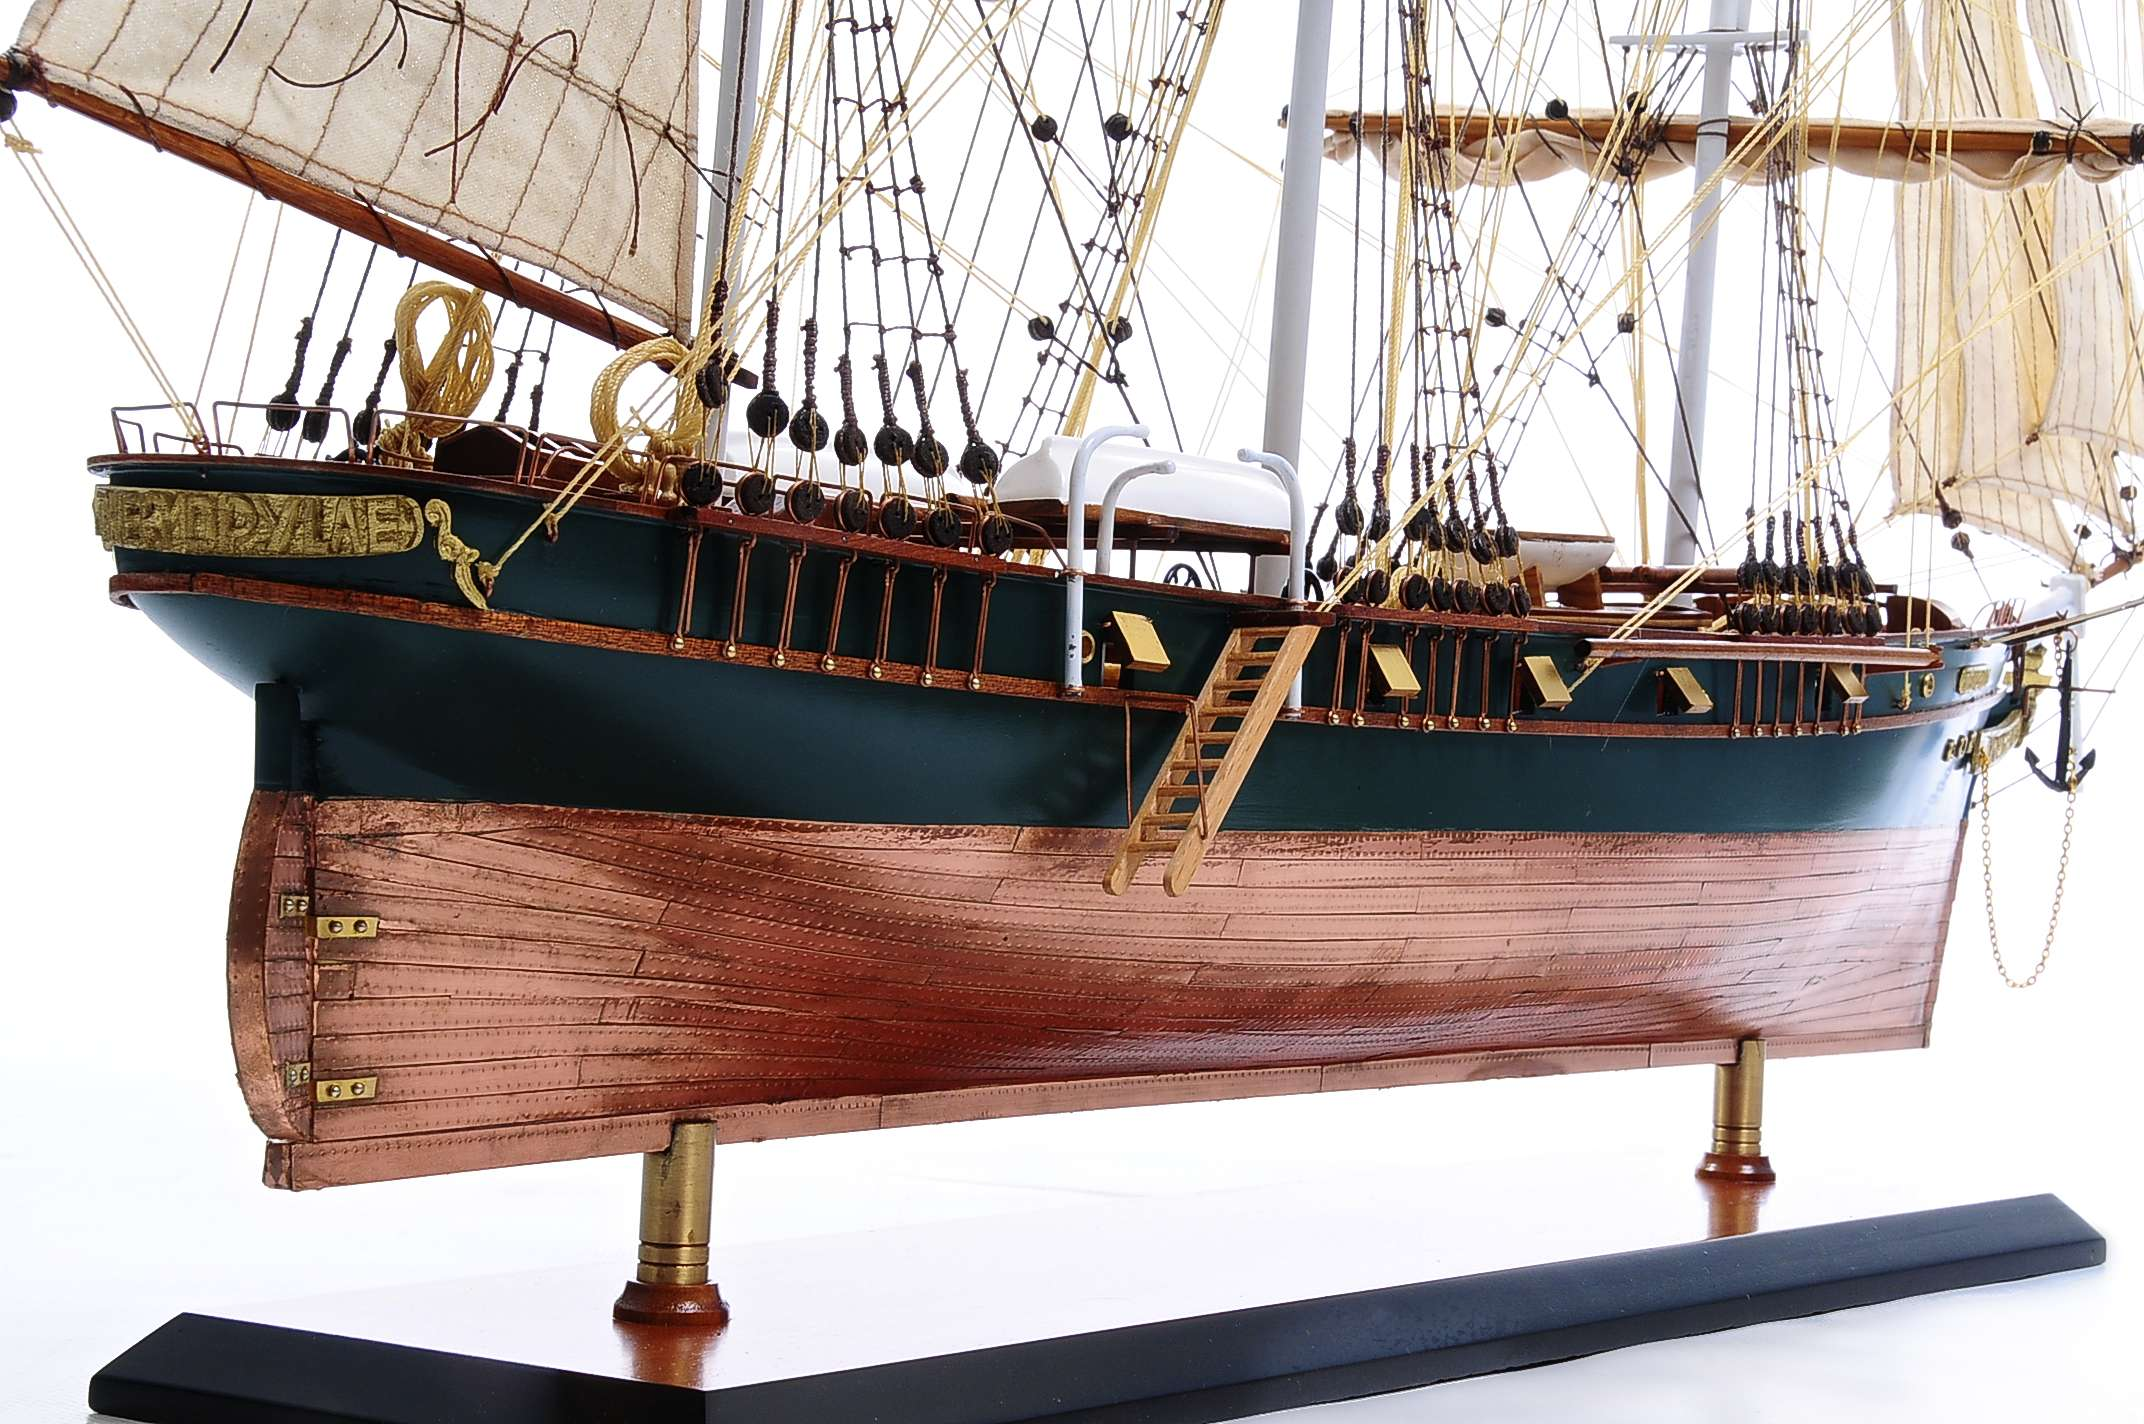 1434-4860-Thermopylae-Model-Boat